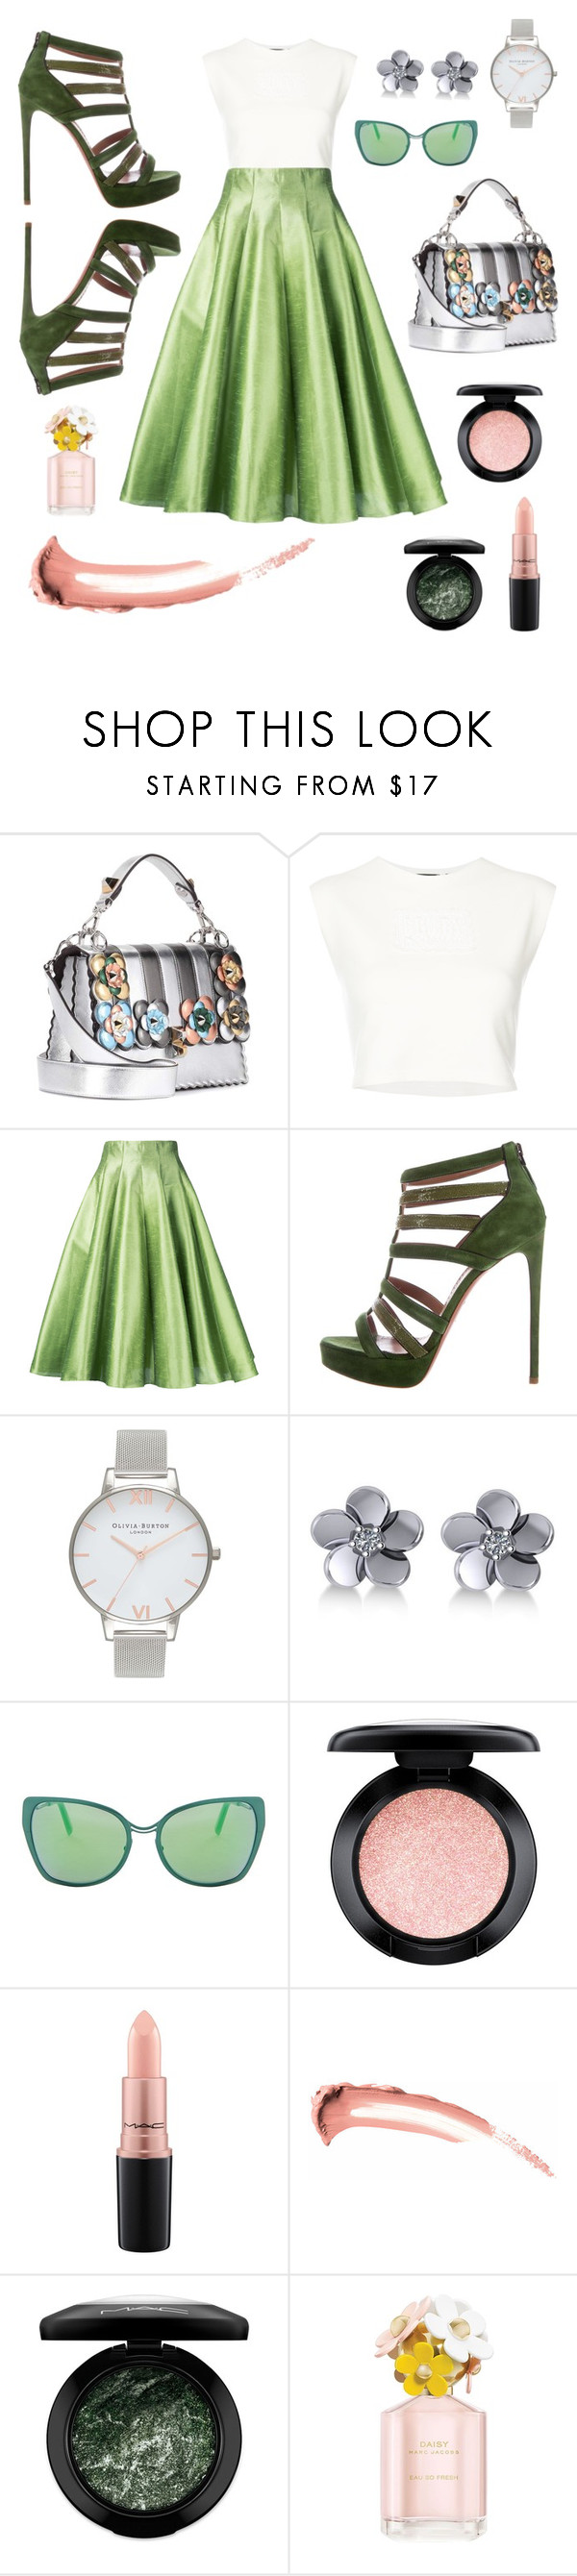 """All about that green skirt"" by lucieschramek on Polyvore featuring Fendi, Puma, Bambah, Olivia Burton, Allurez, Cutler and Gross, MAC Cosmetics and Marc Jacobs"